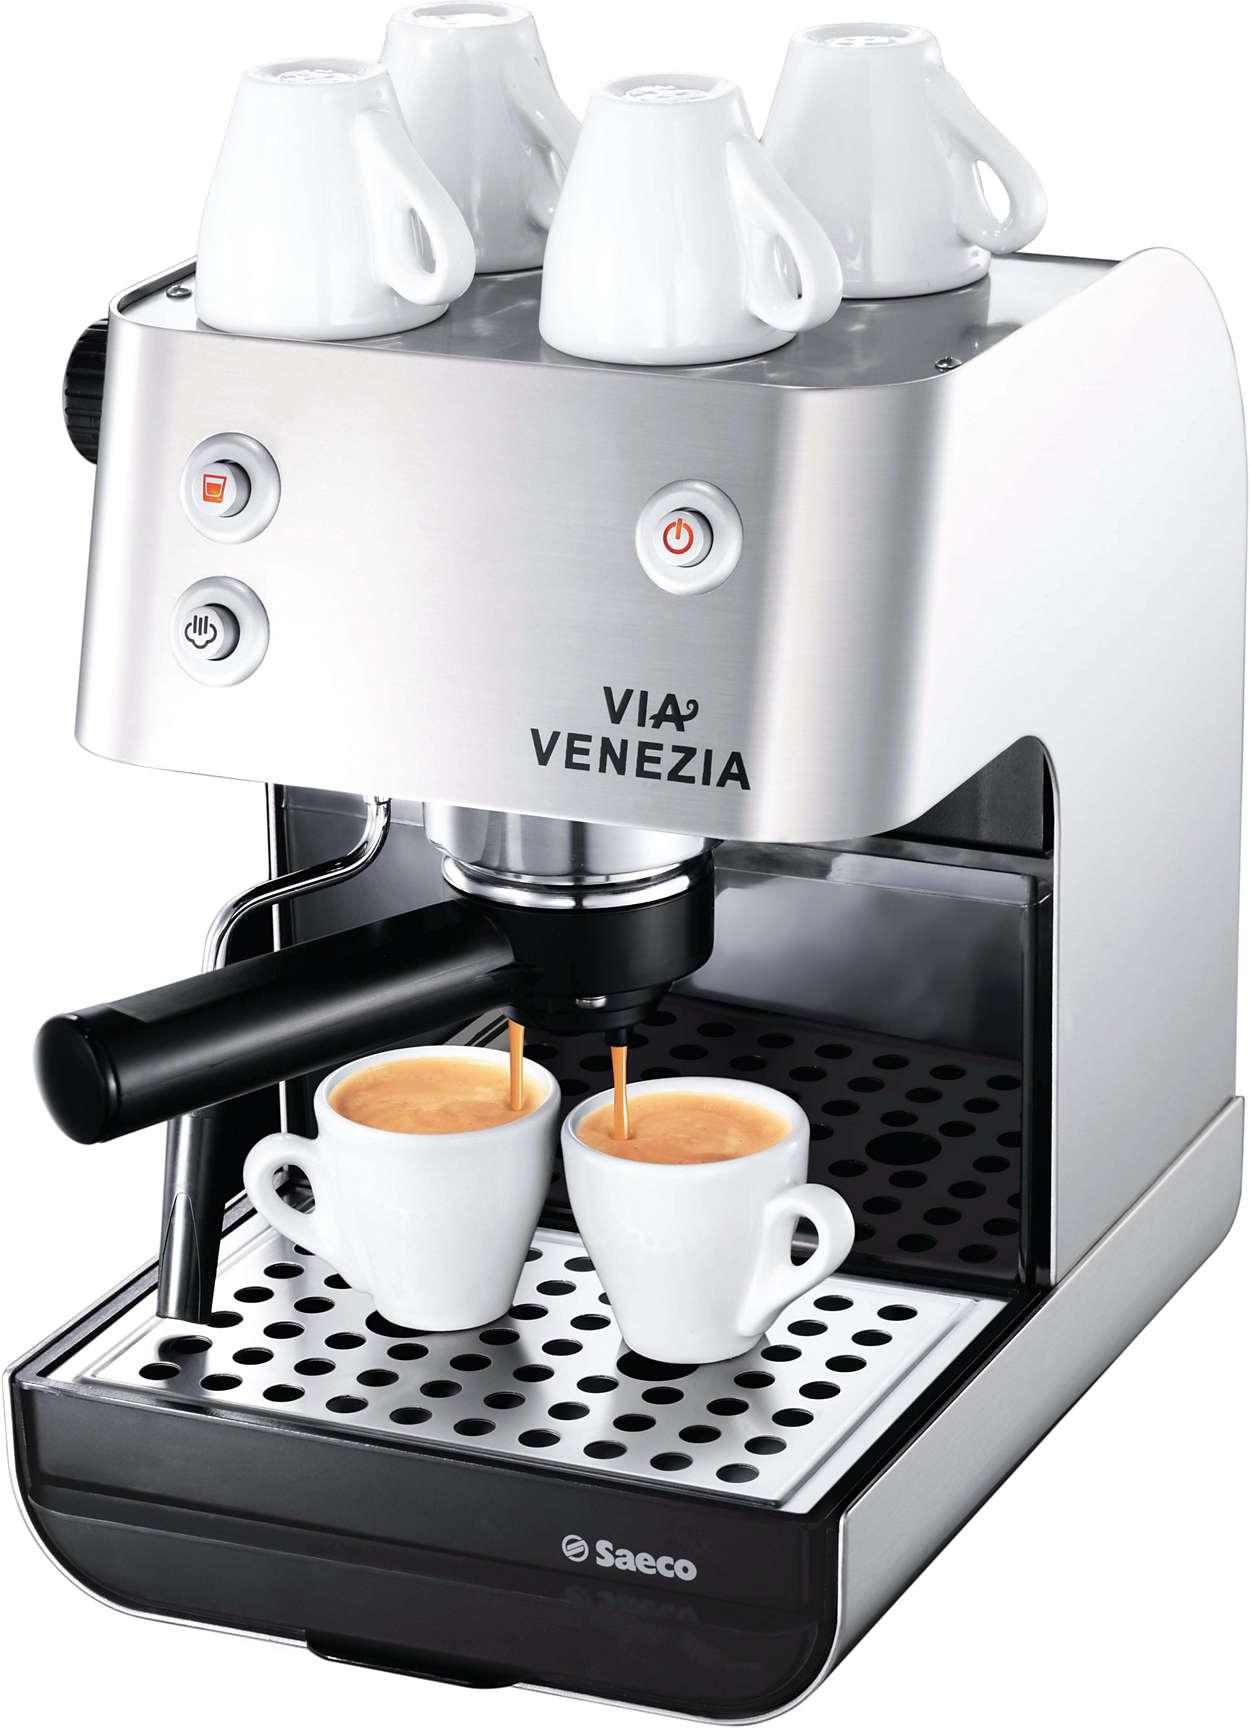 Saeco Vanezia Manual Espresso